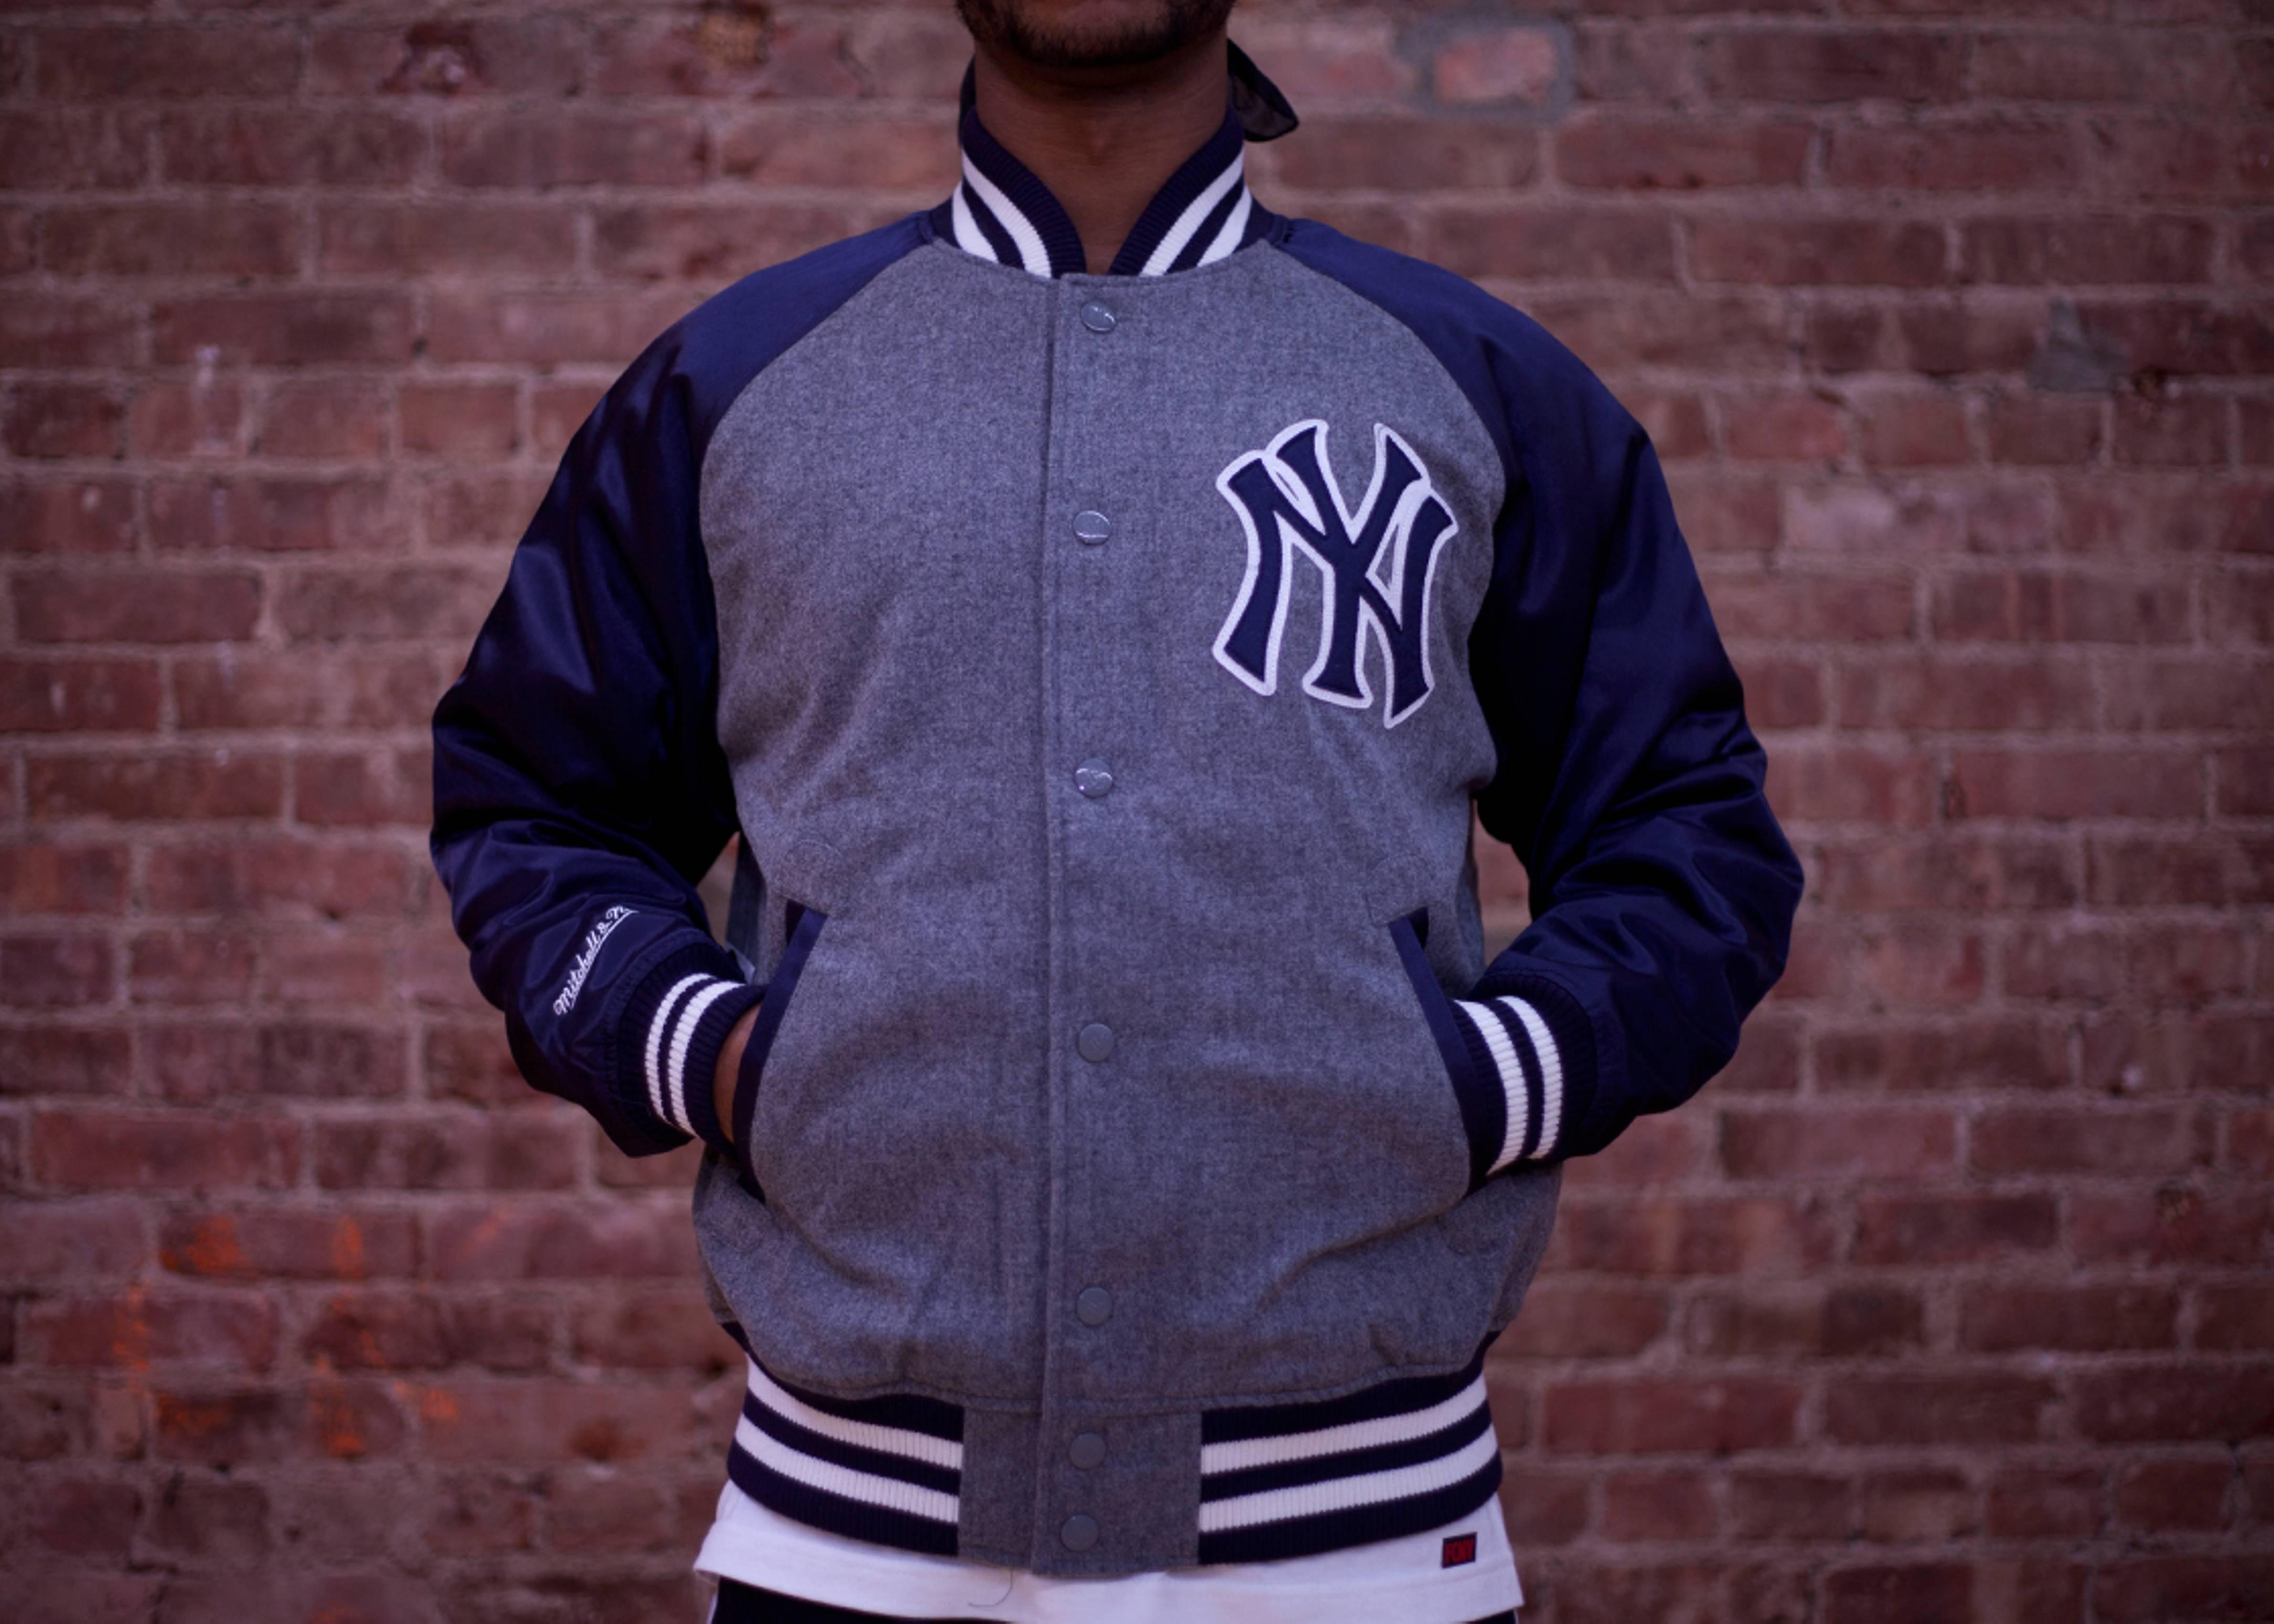 wholesale dealer d0416 b9a88 New York Yankees Triple Play Jacket - Mitchell & Ness - 3 ...